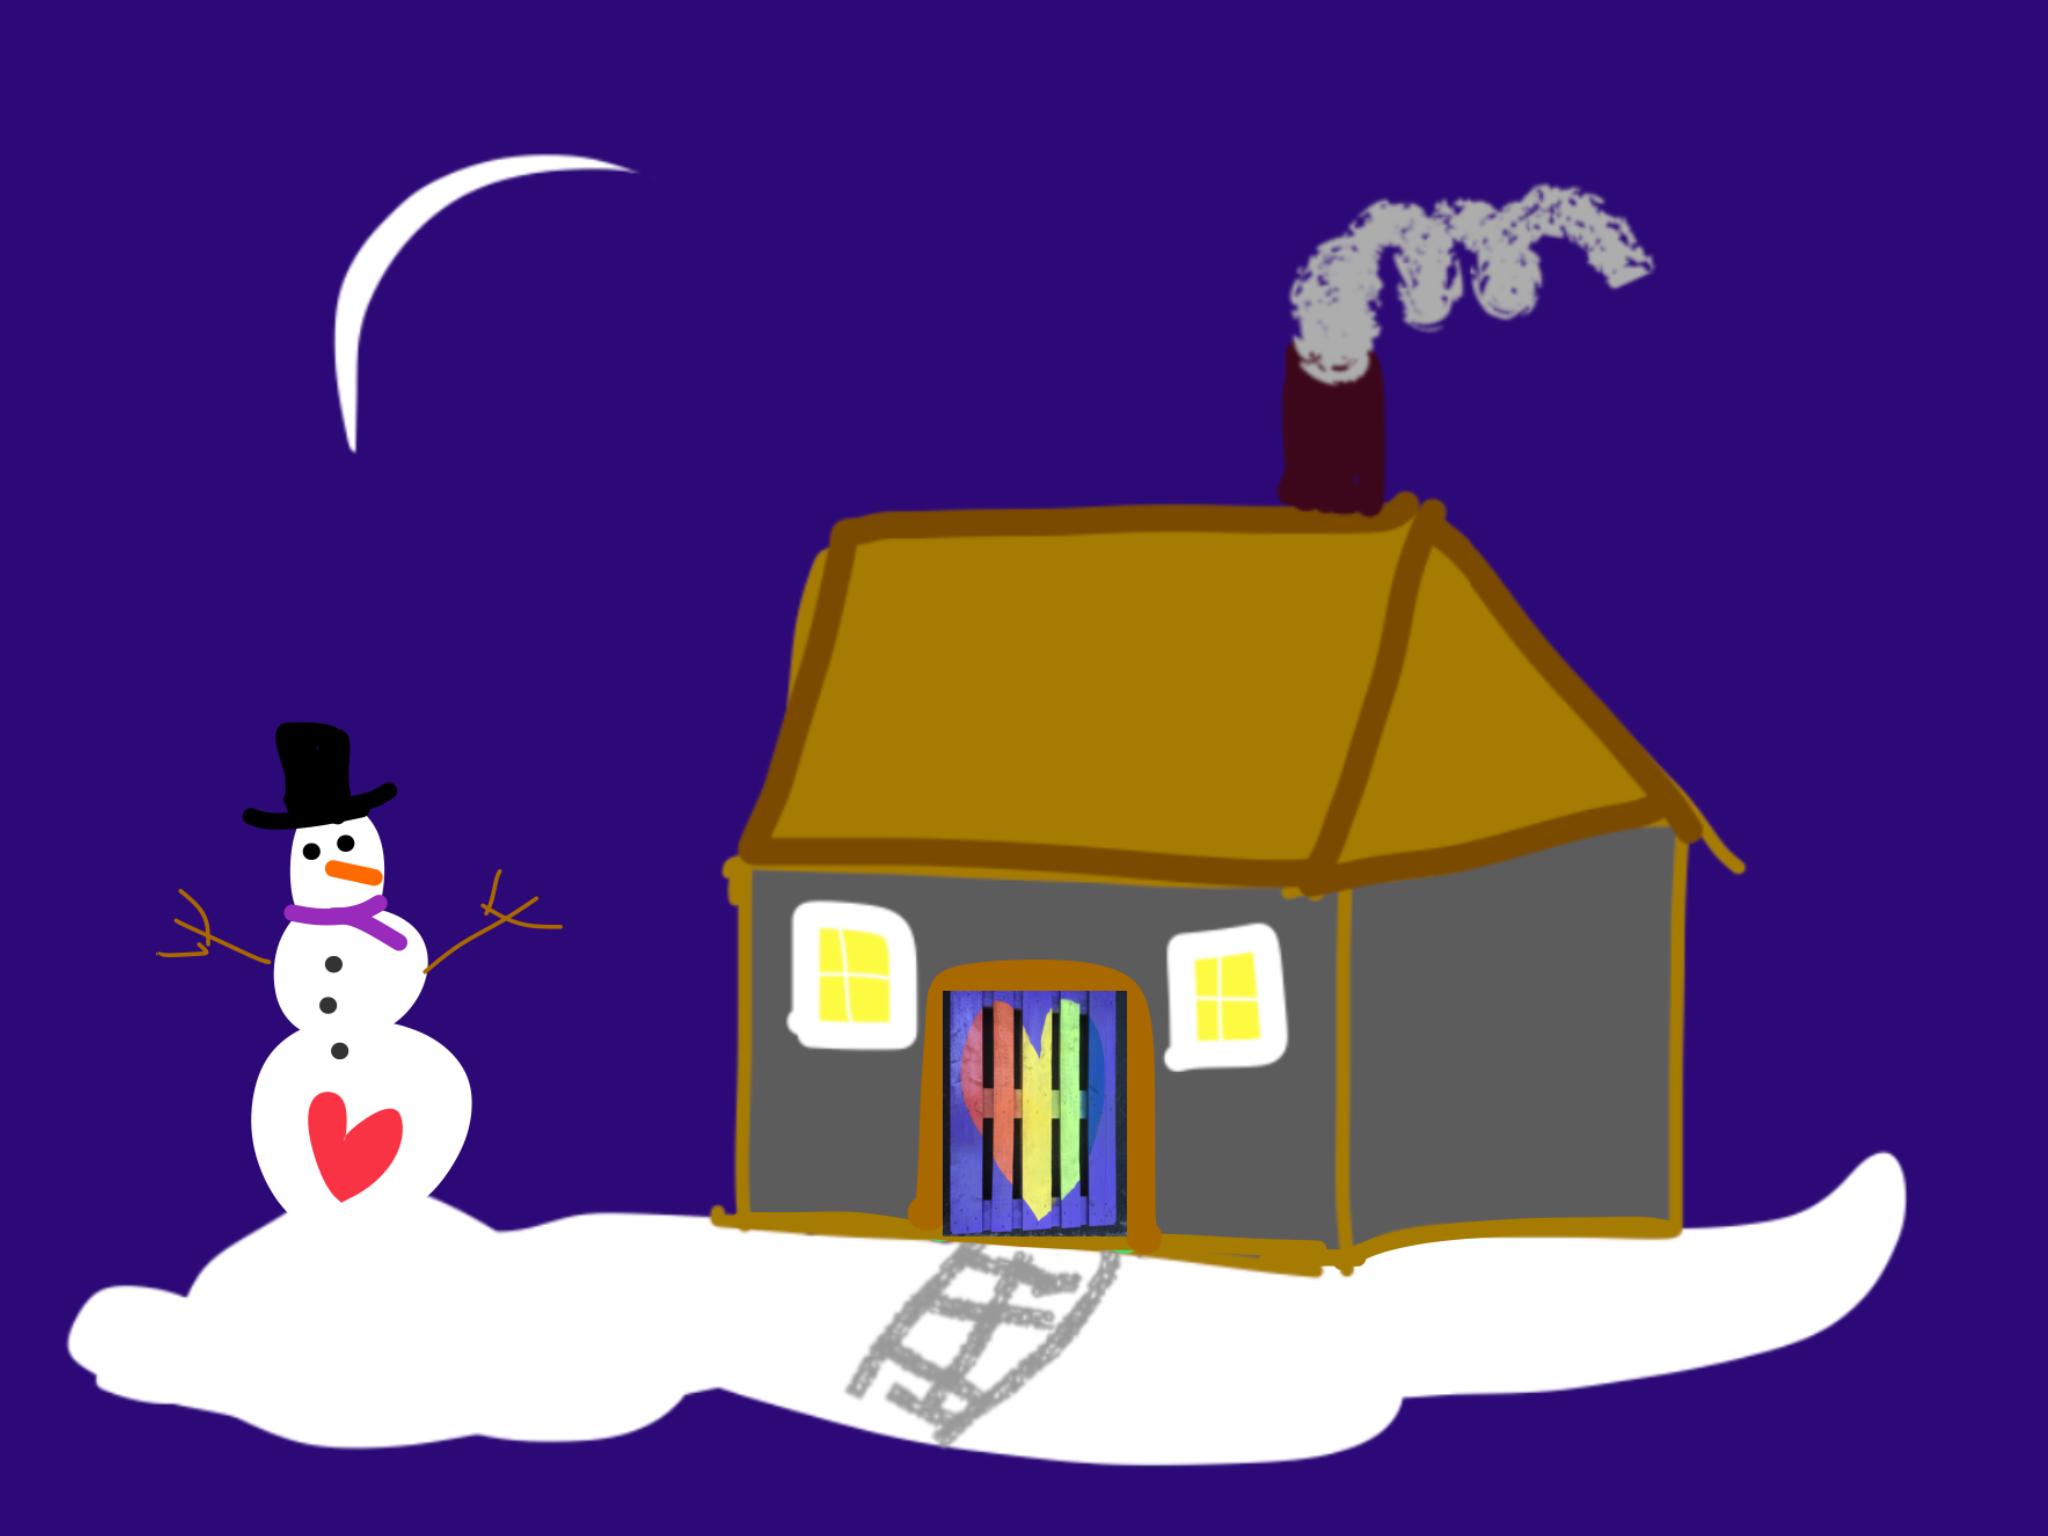 Christmas Cards - Artist Pick